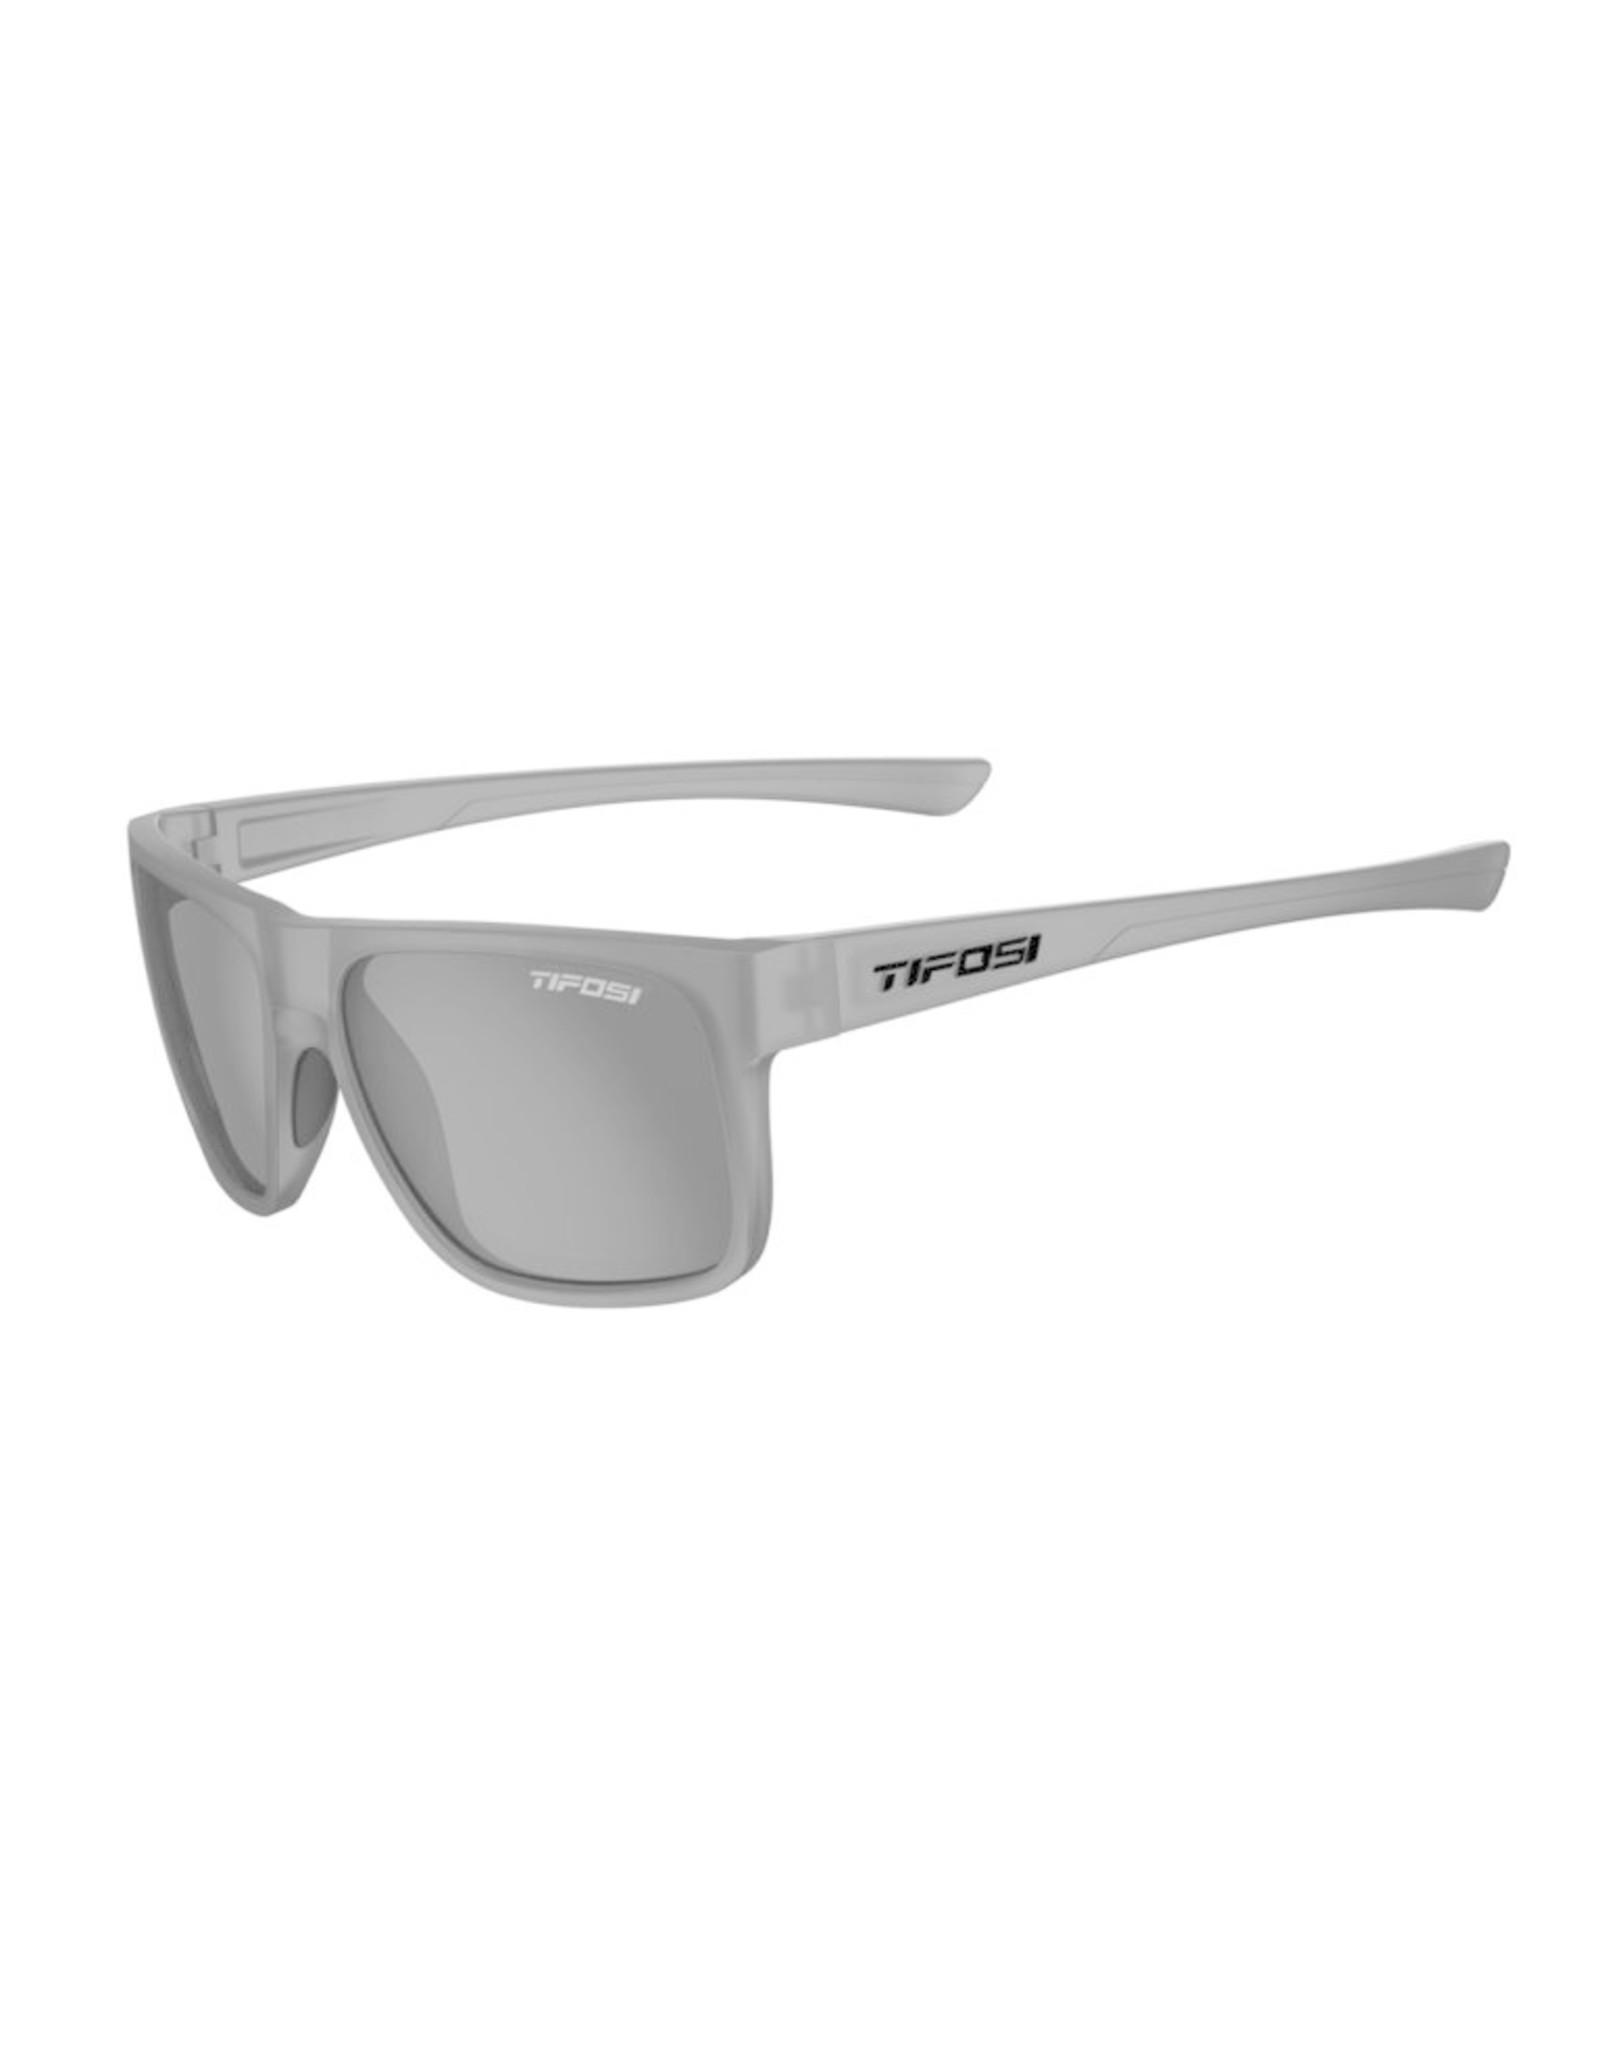 Tifosi Optics Swick, Satin Vapor Single Lens Sunglasses - Smoke